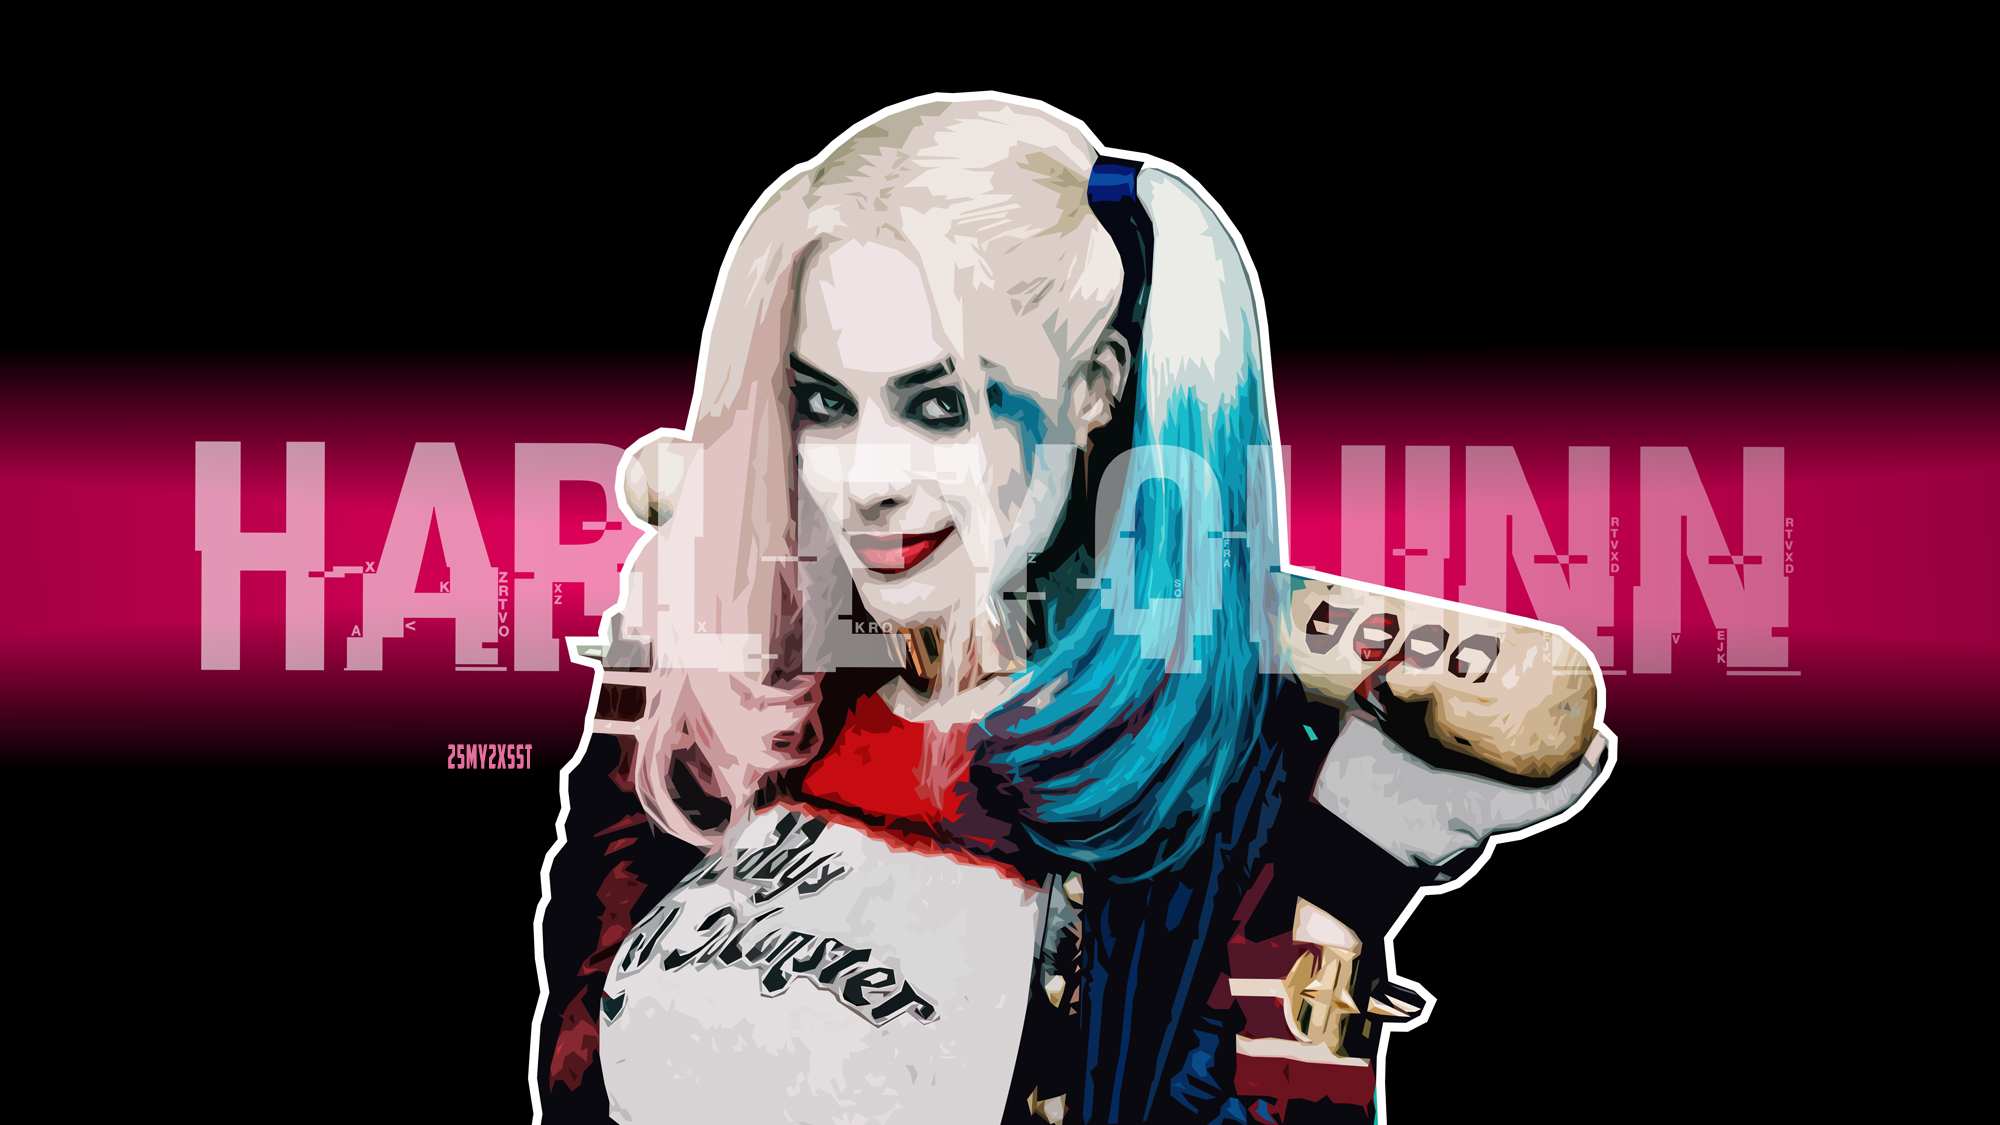 Good Wallpaper Movie Harley Quinn - 837471  Pic_187870.jpg